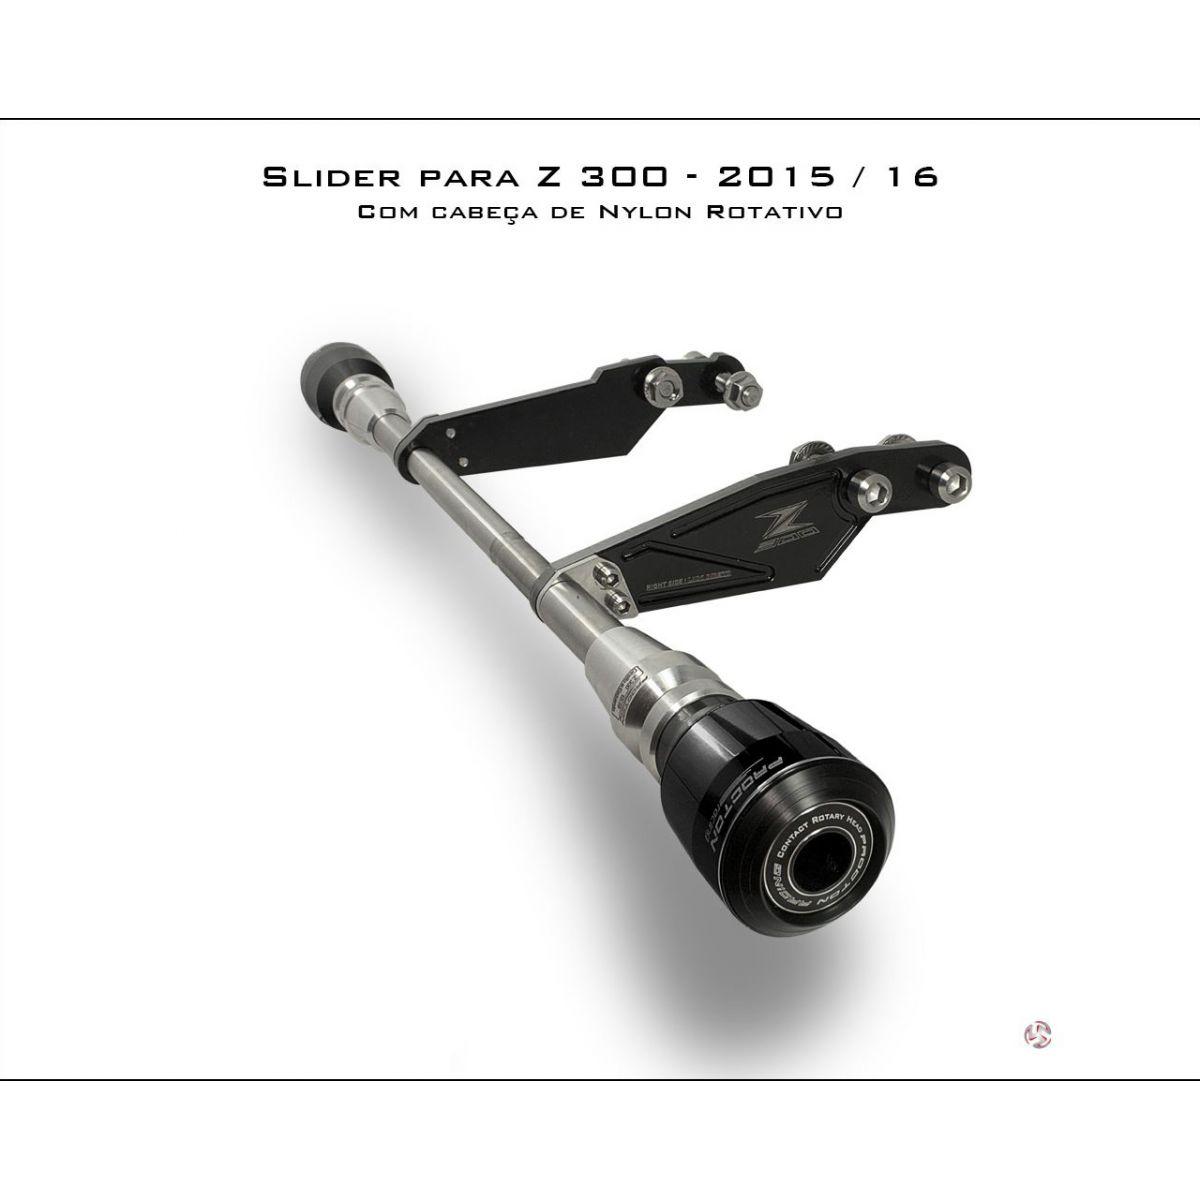 Slider Procton com Amortecimento Kawasaki Z300 15/16